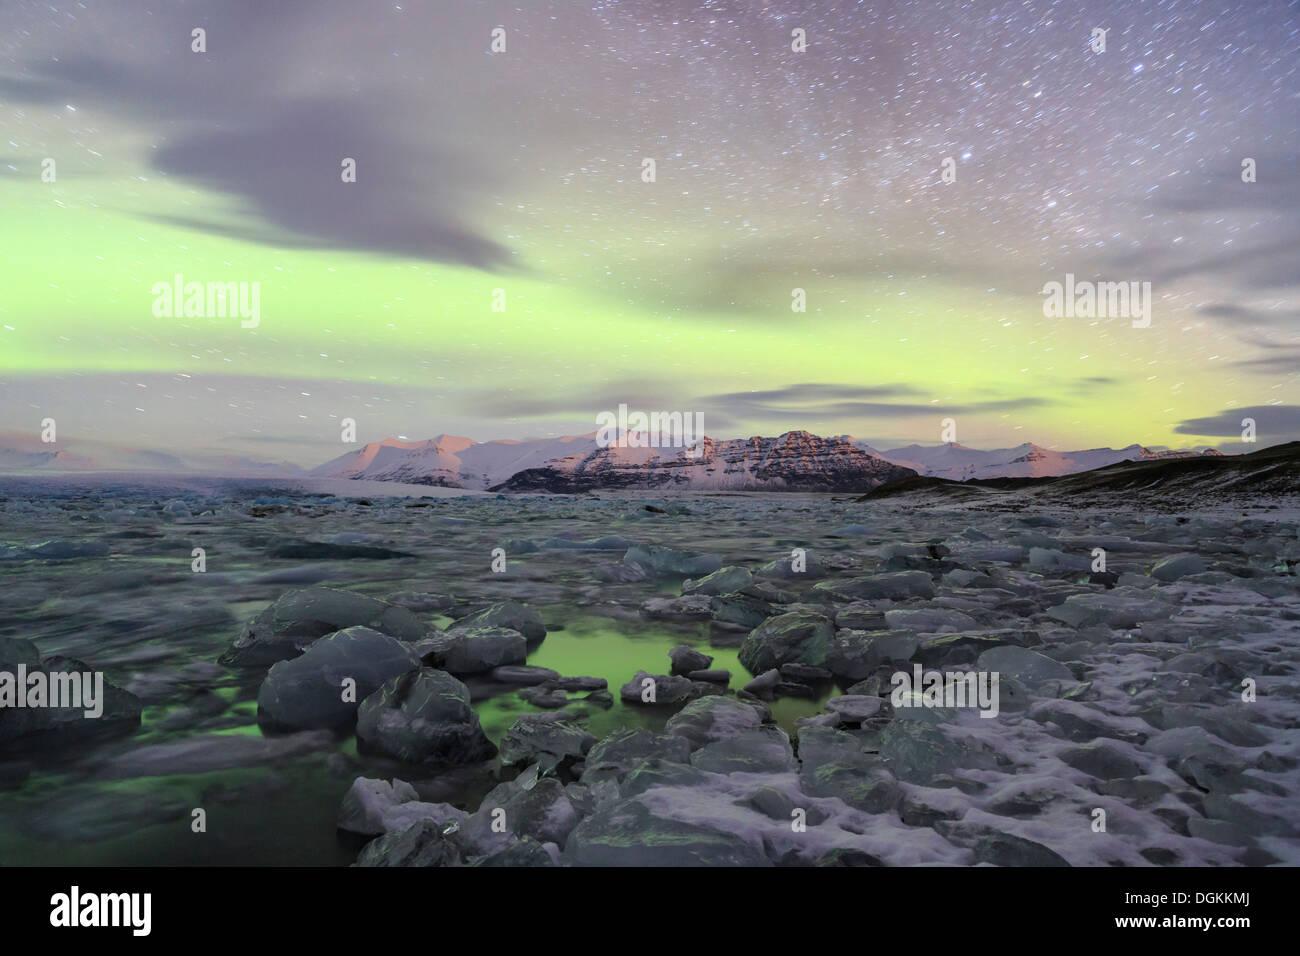 Aurora borealis over the Jokulsarlon Glacier Lagoon in Iceland. Stock Photo